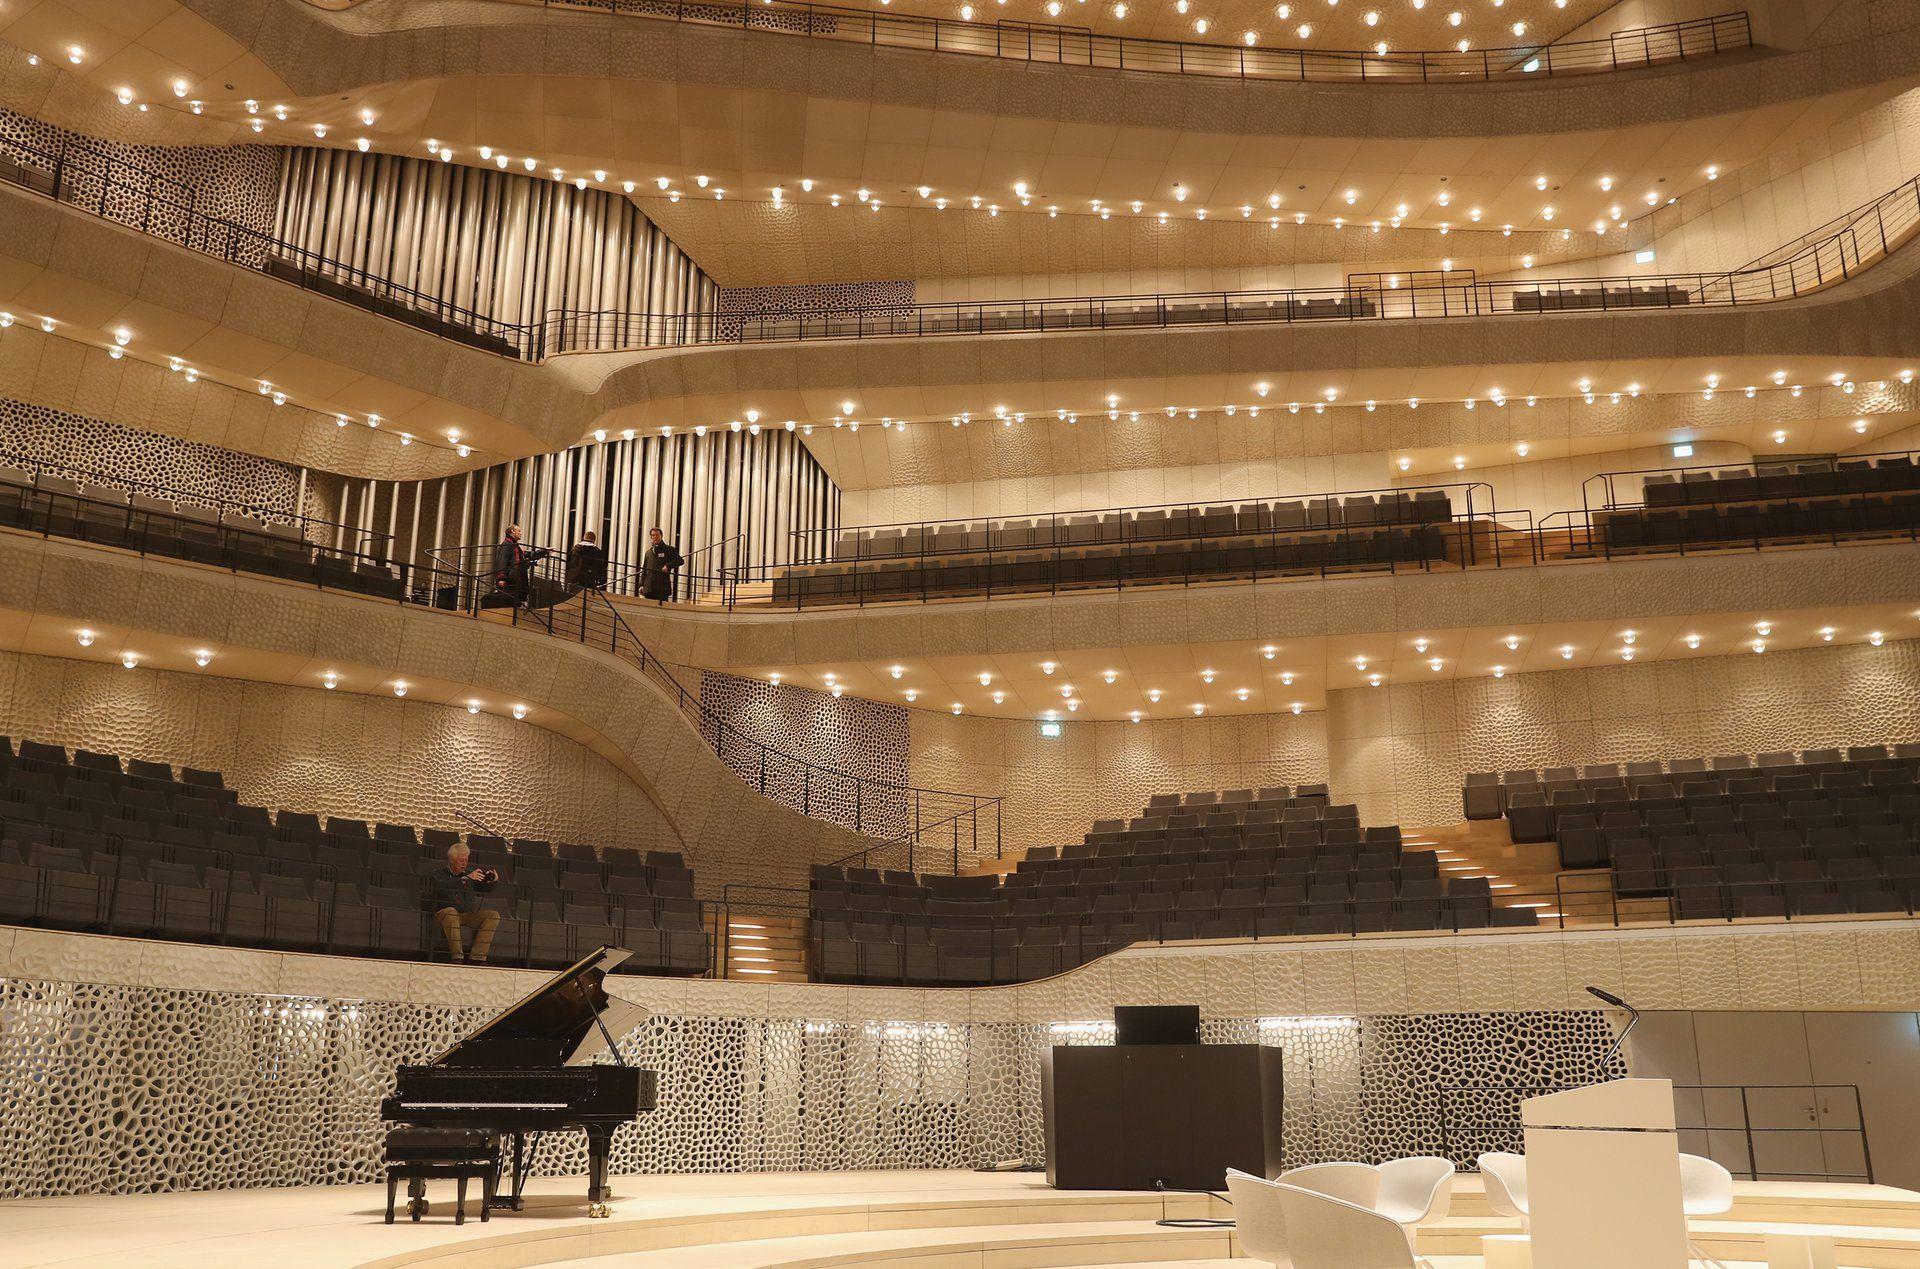 We Thought It Was Going To Destroy Us Herzog And De Meuron S Hamburg Miracle Hamburg Dubai Architecture Elbphilharmonie Concert Hall